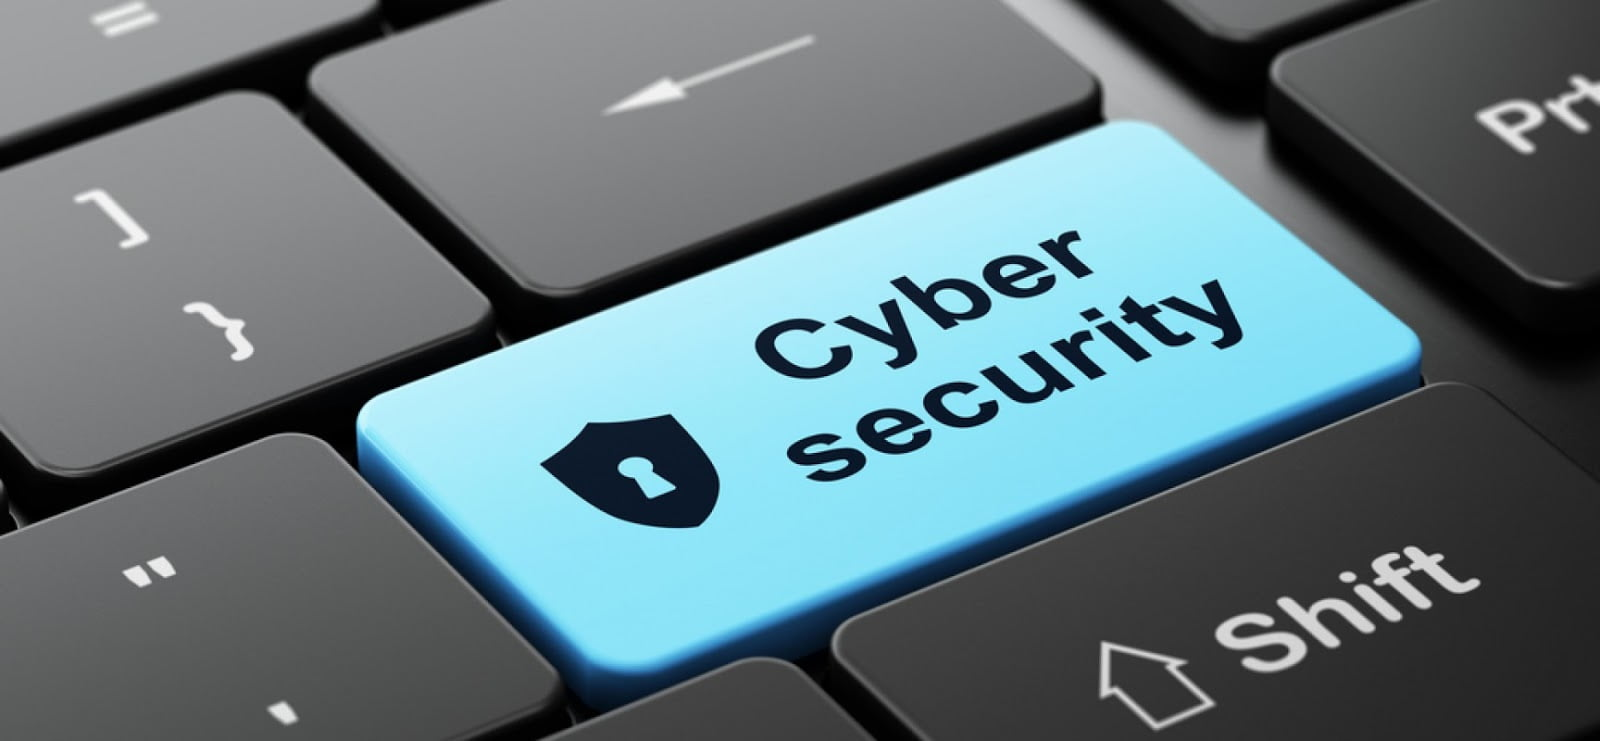 Cyber Warfare - Latest Weapon For Mass Destruction